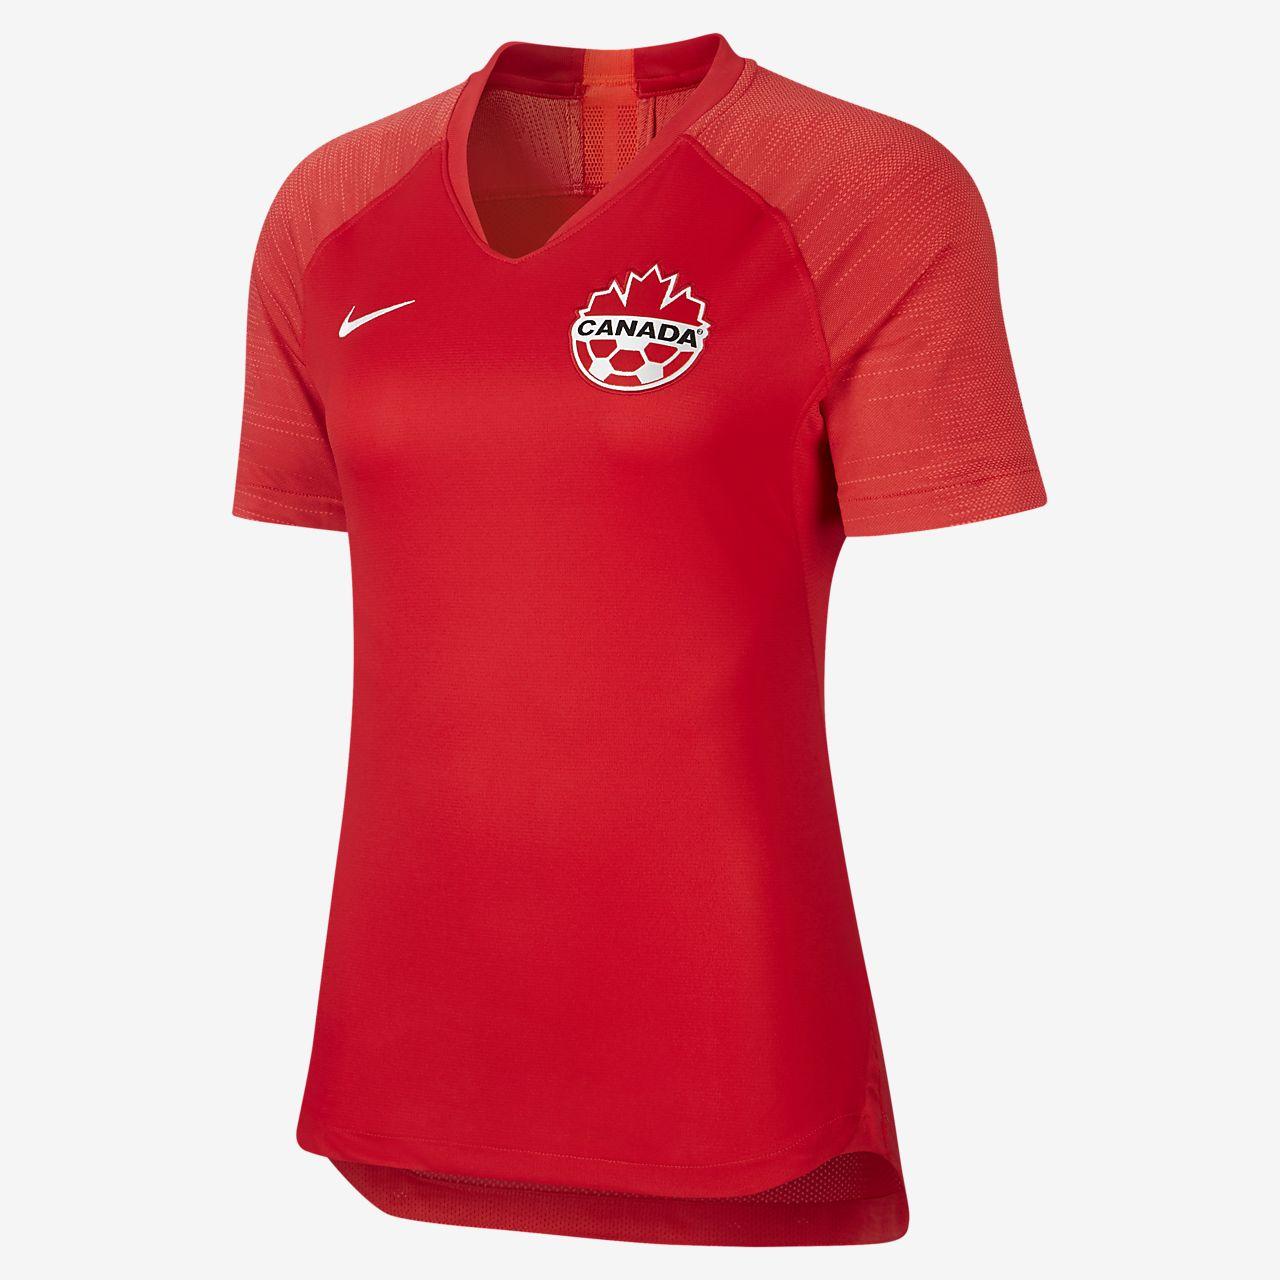 premium selection 27031 1650c Canada 2019 Stadium Home Women's Soccer Jersey